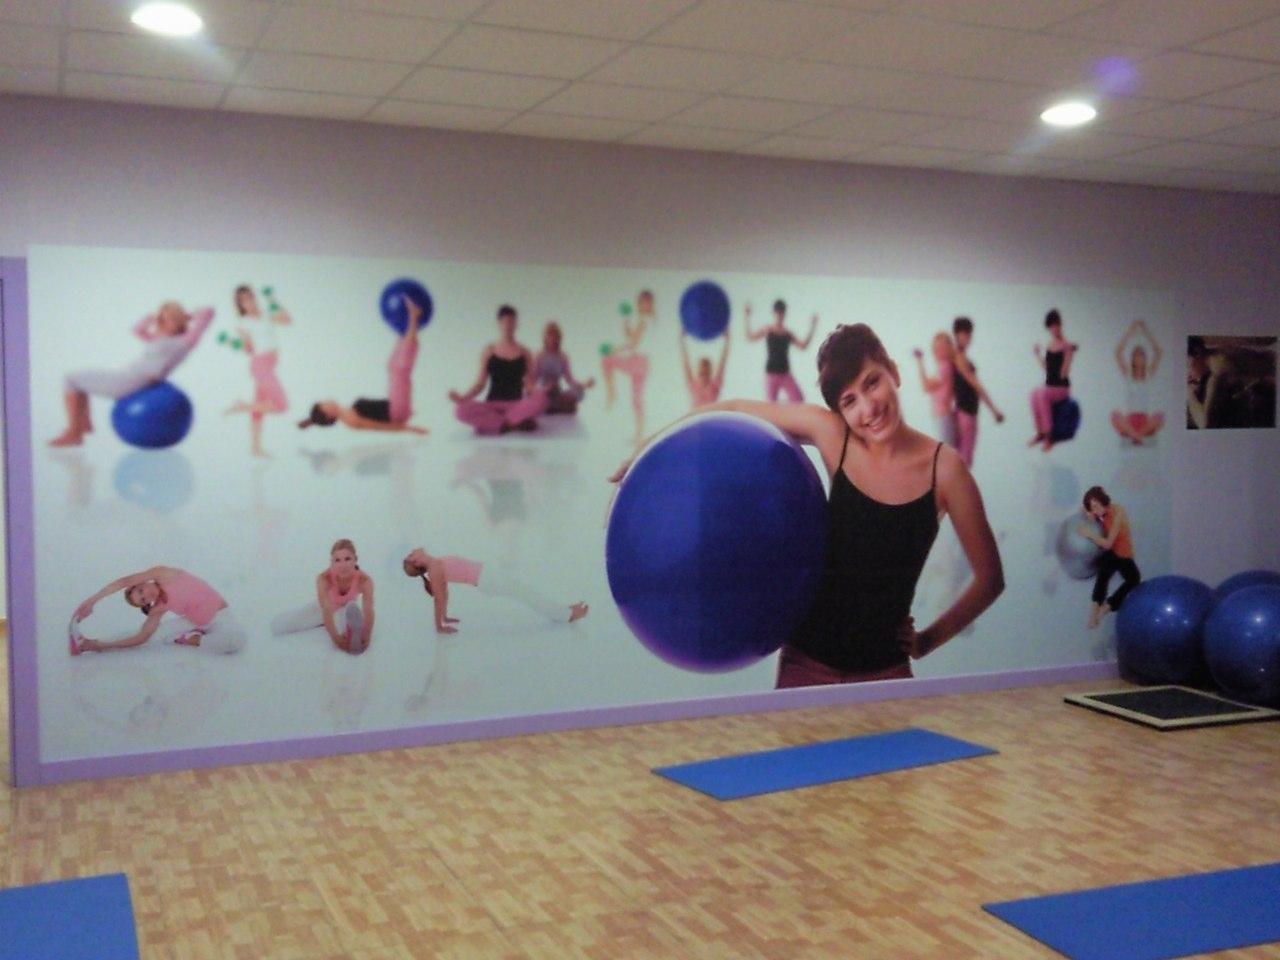 Artedecora blog de dise o gr fico - Decoracion de gimnasios ...